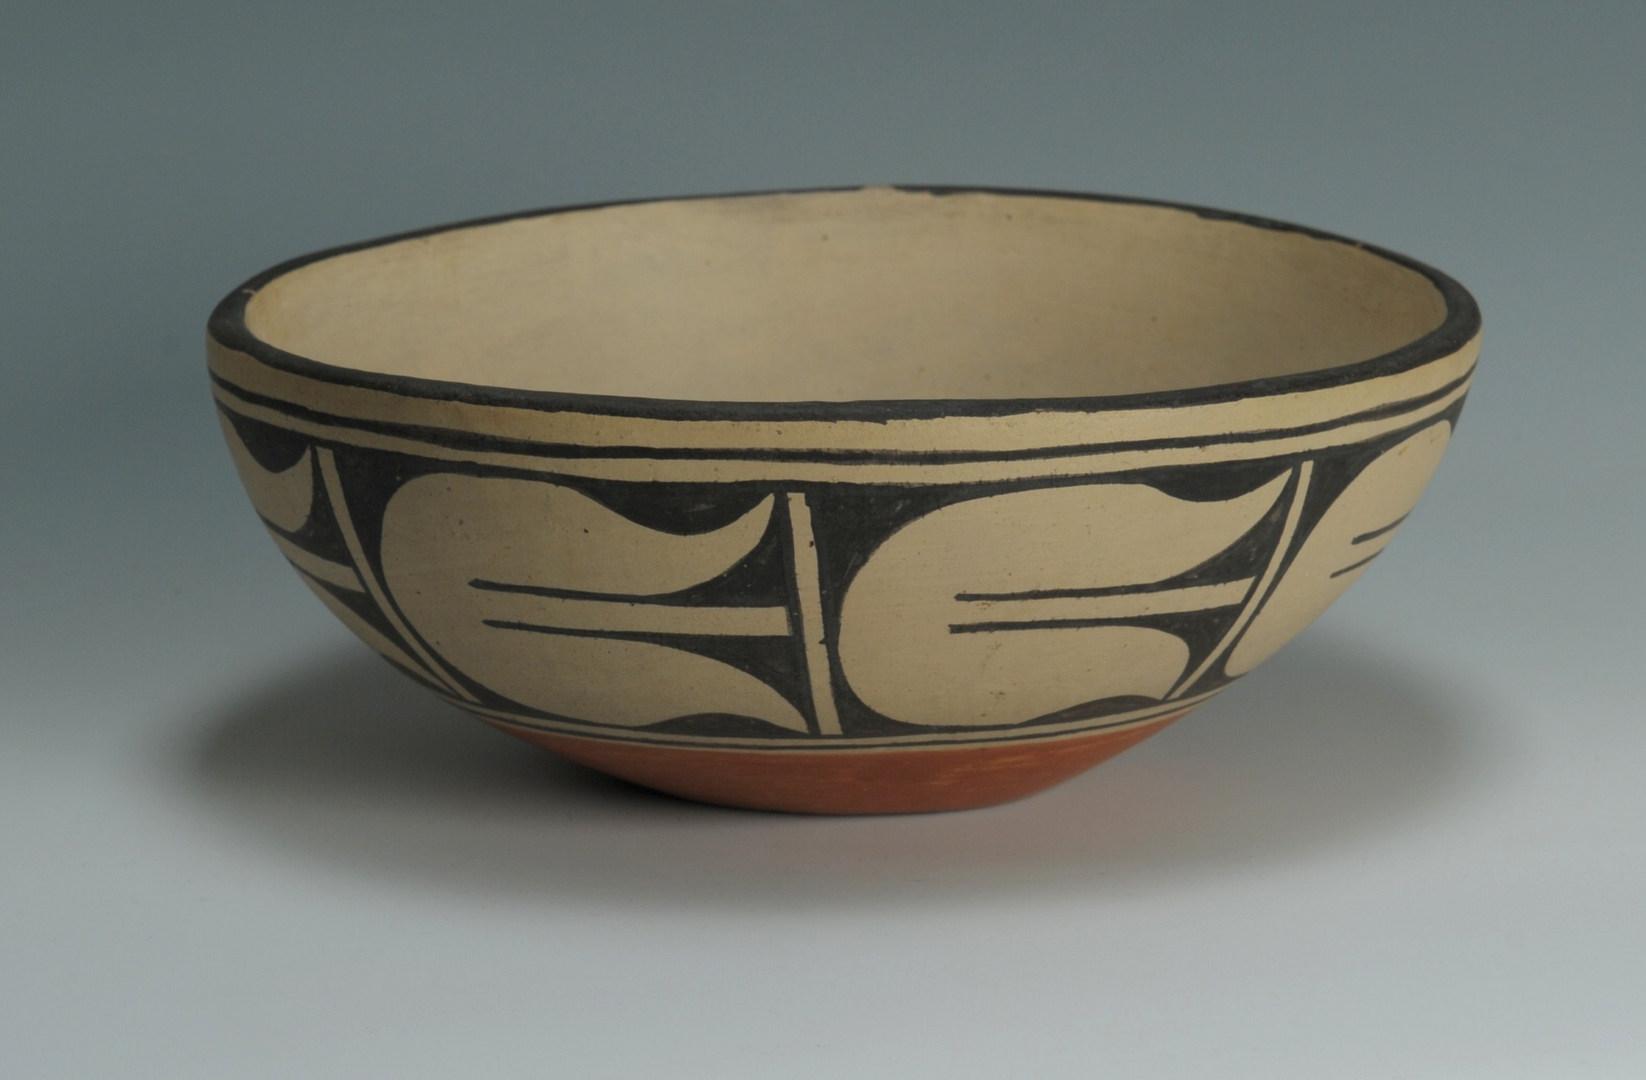 Lot 400: Santa Domingo bowl, basket and vase, Melchor